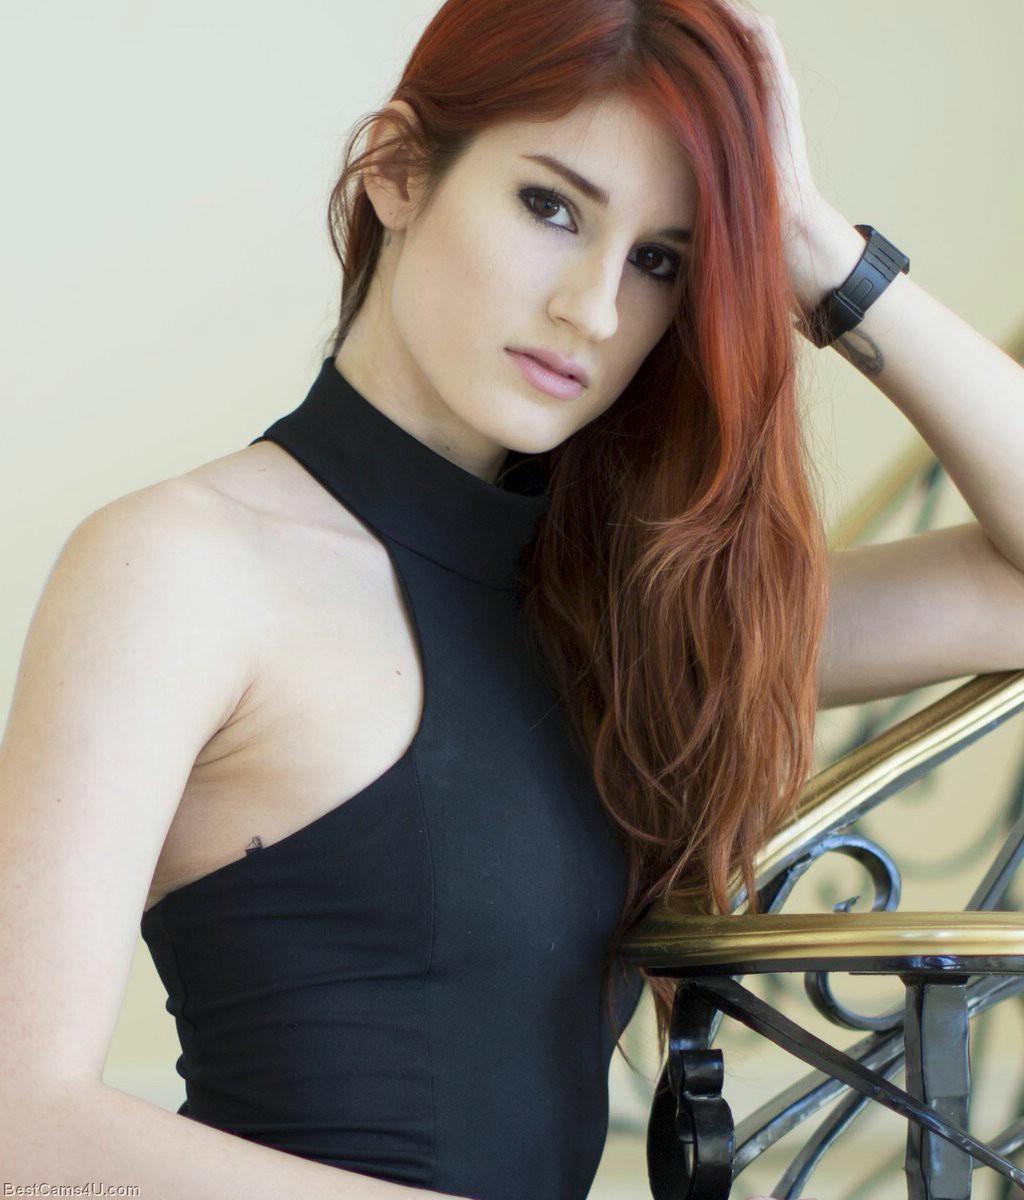 Mia Rand | BestCams4U